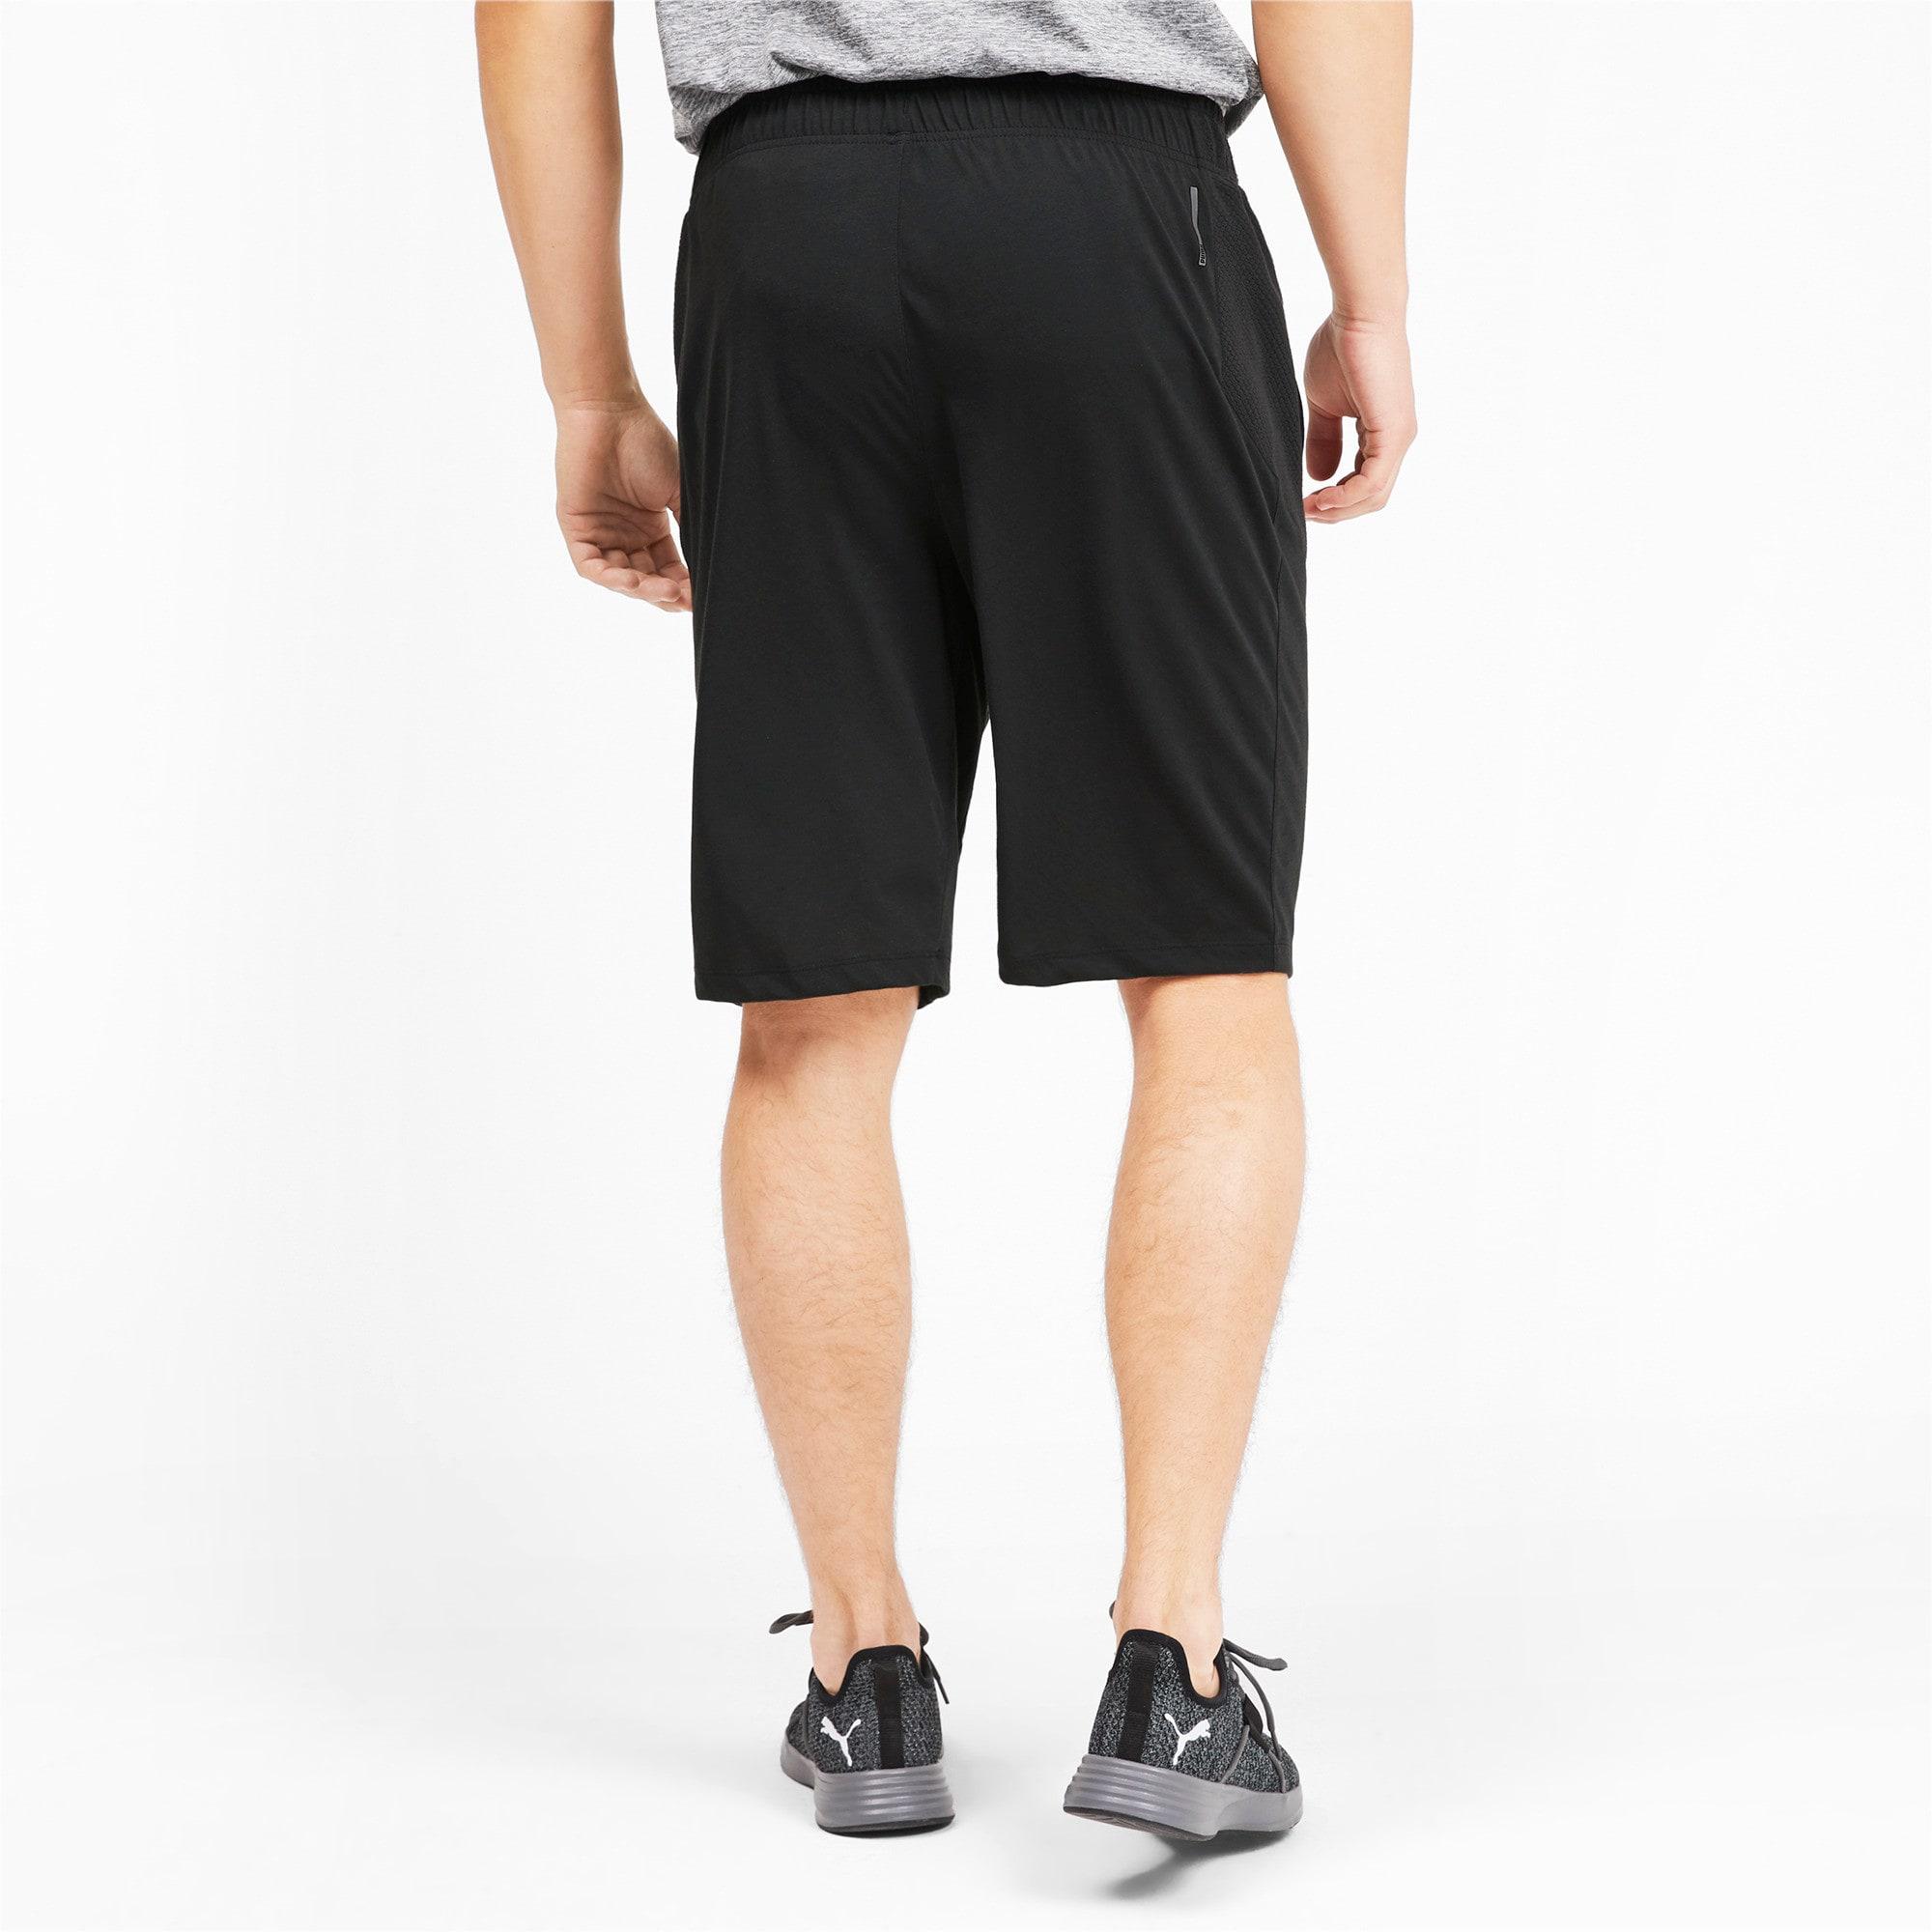 Miniatura 3 de Shorts Reactive Drirelease para hombre, Puma Black, mediano